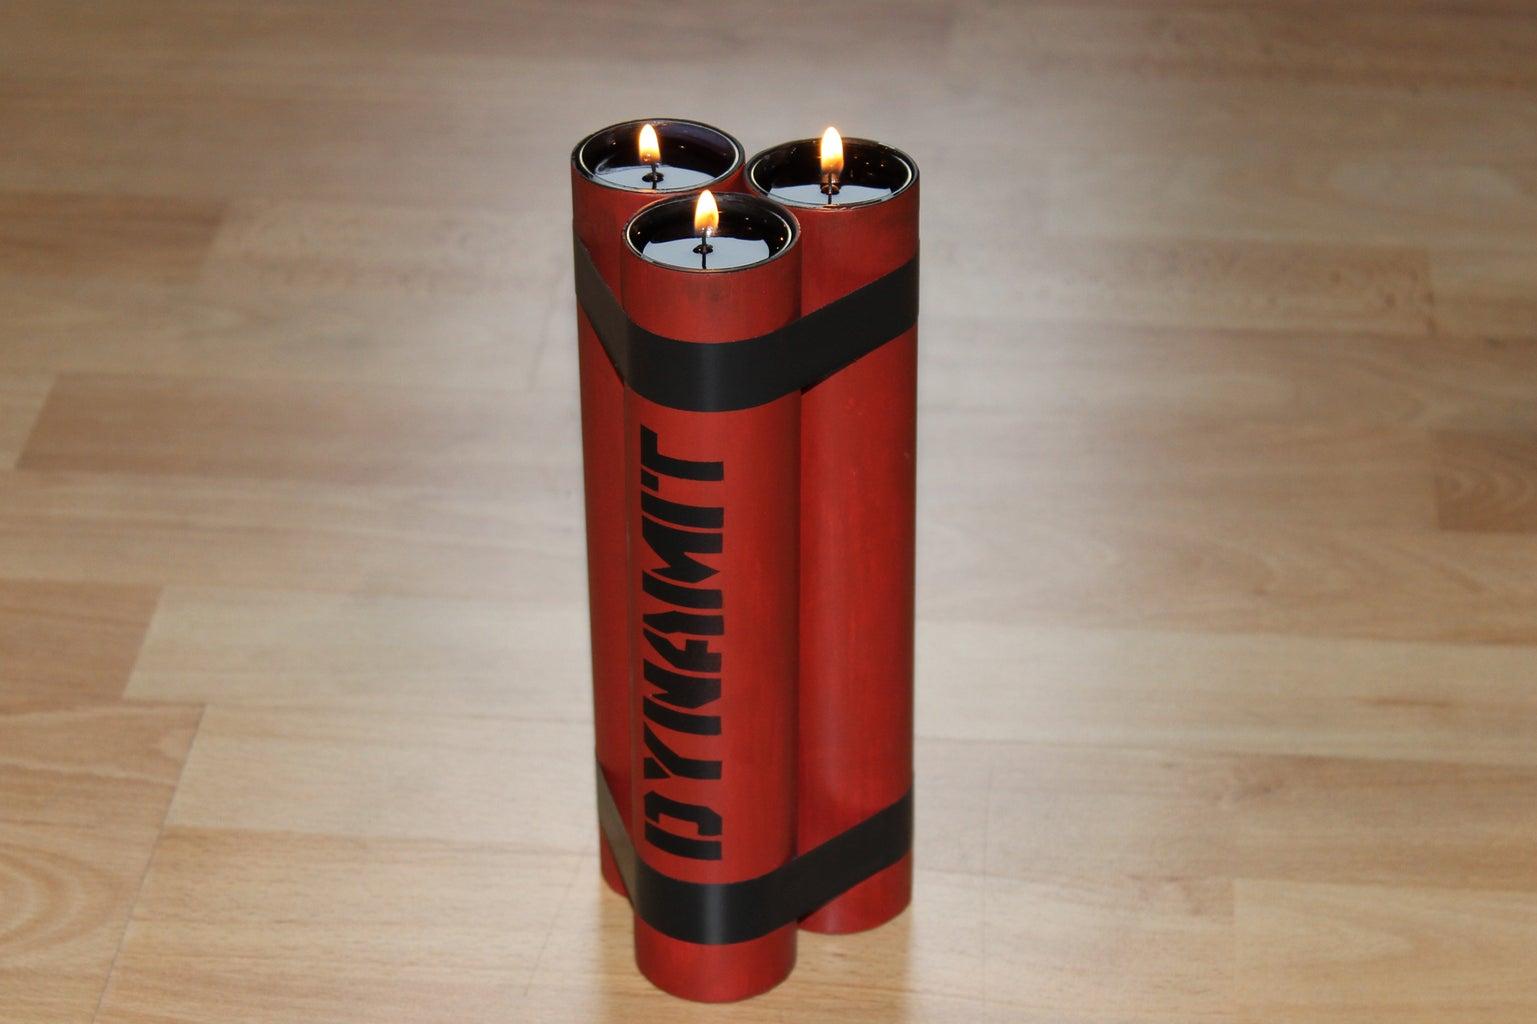 Dynamite Candle Holder